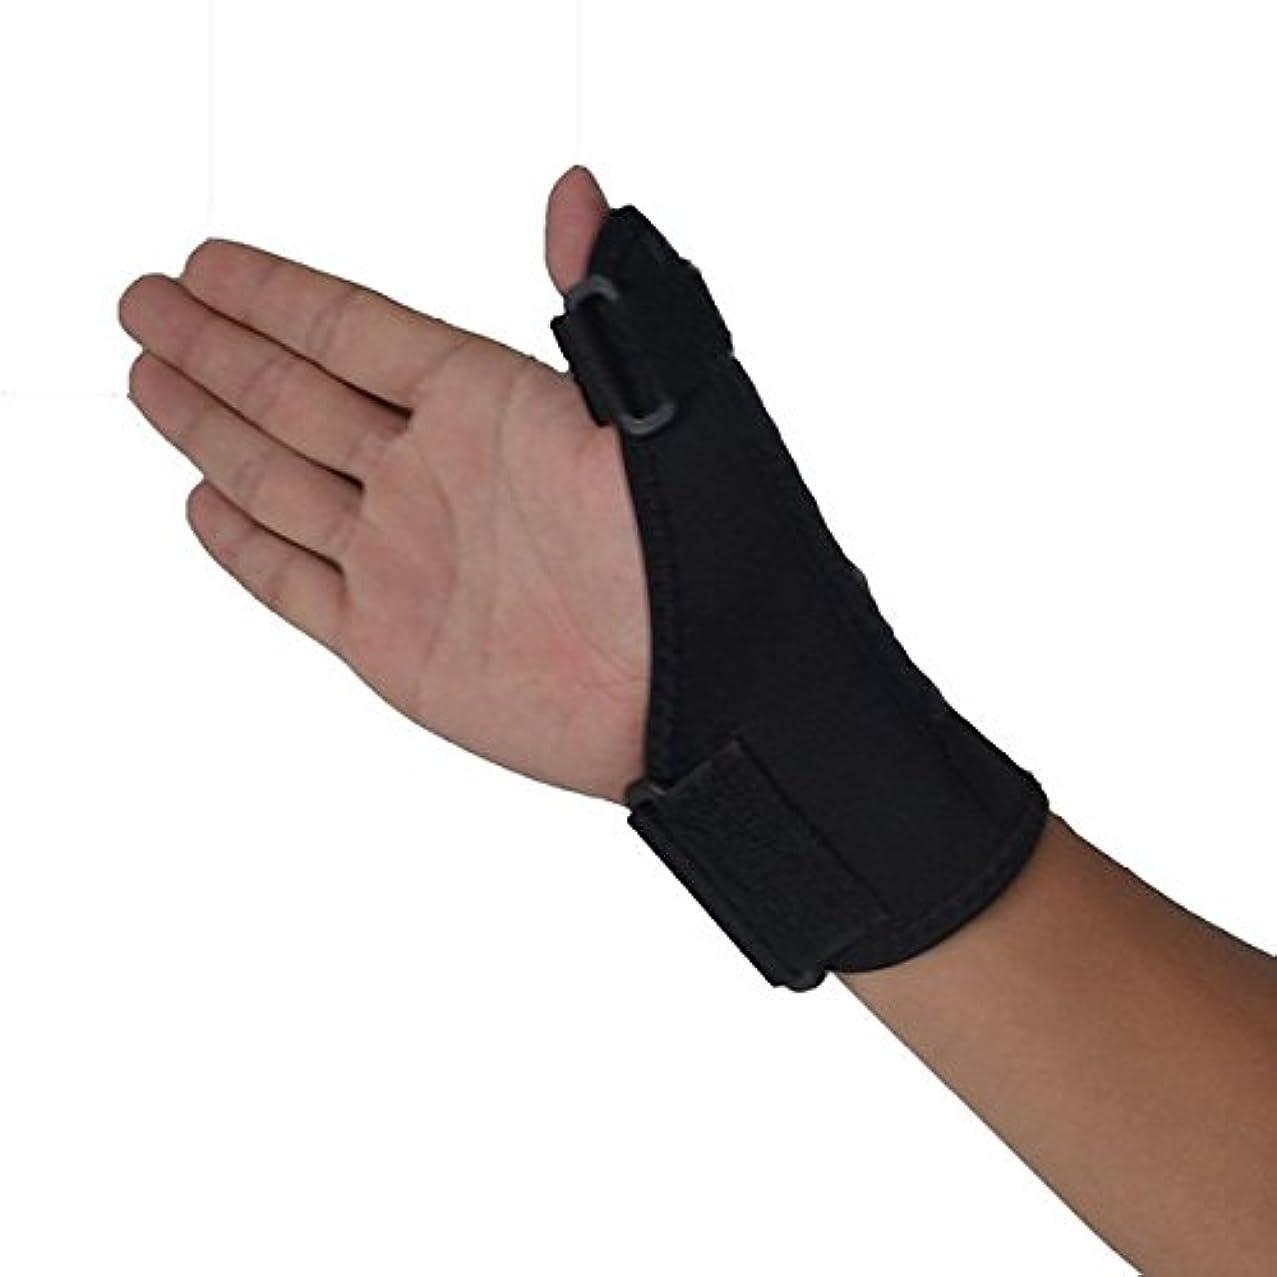 Forfar Thumb Protector Thumb Brace Hand Wrist Brace Guard Wrap Glove Support Gym Adjustable Equipment Black